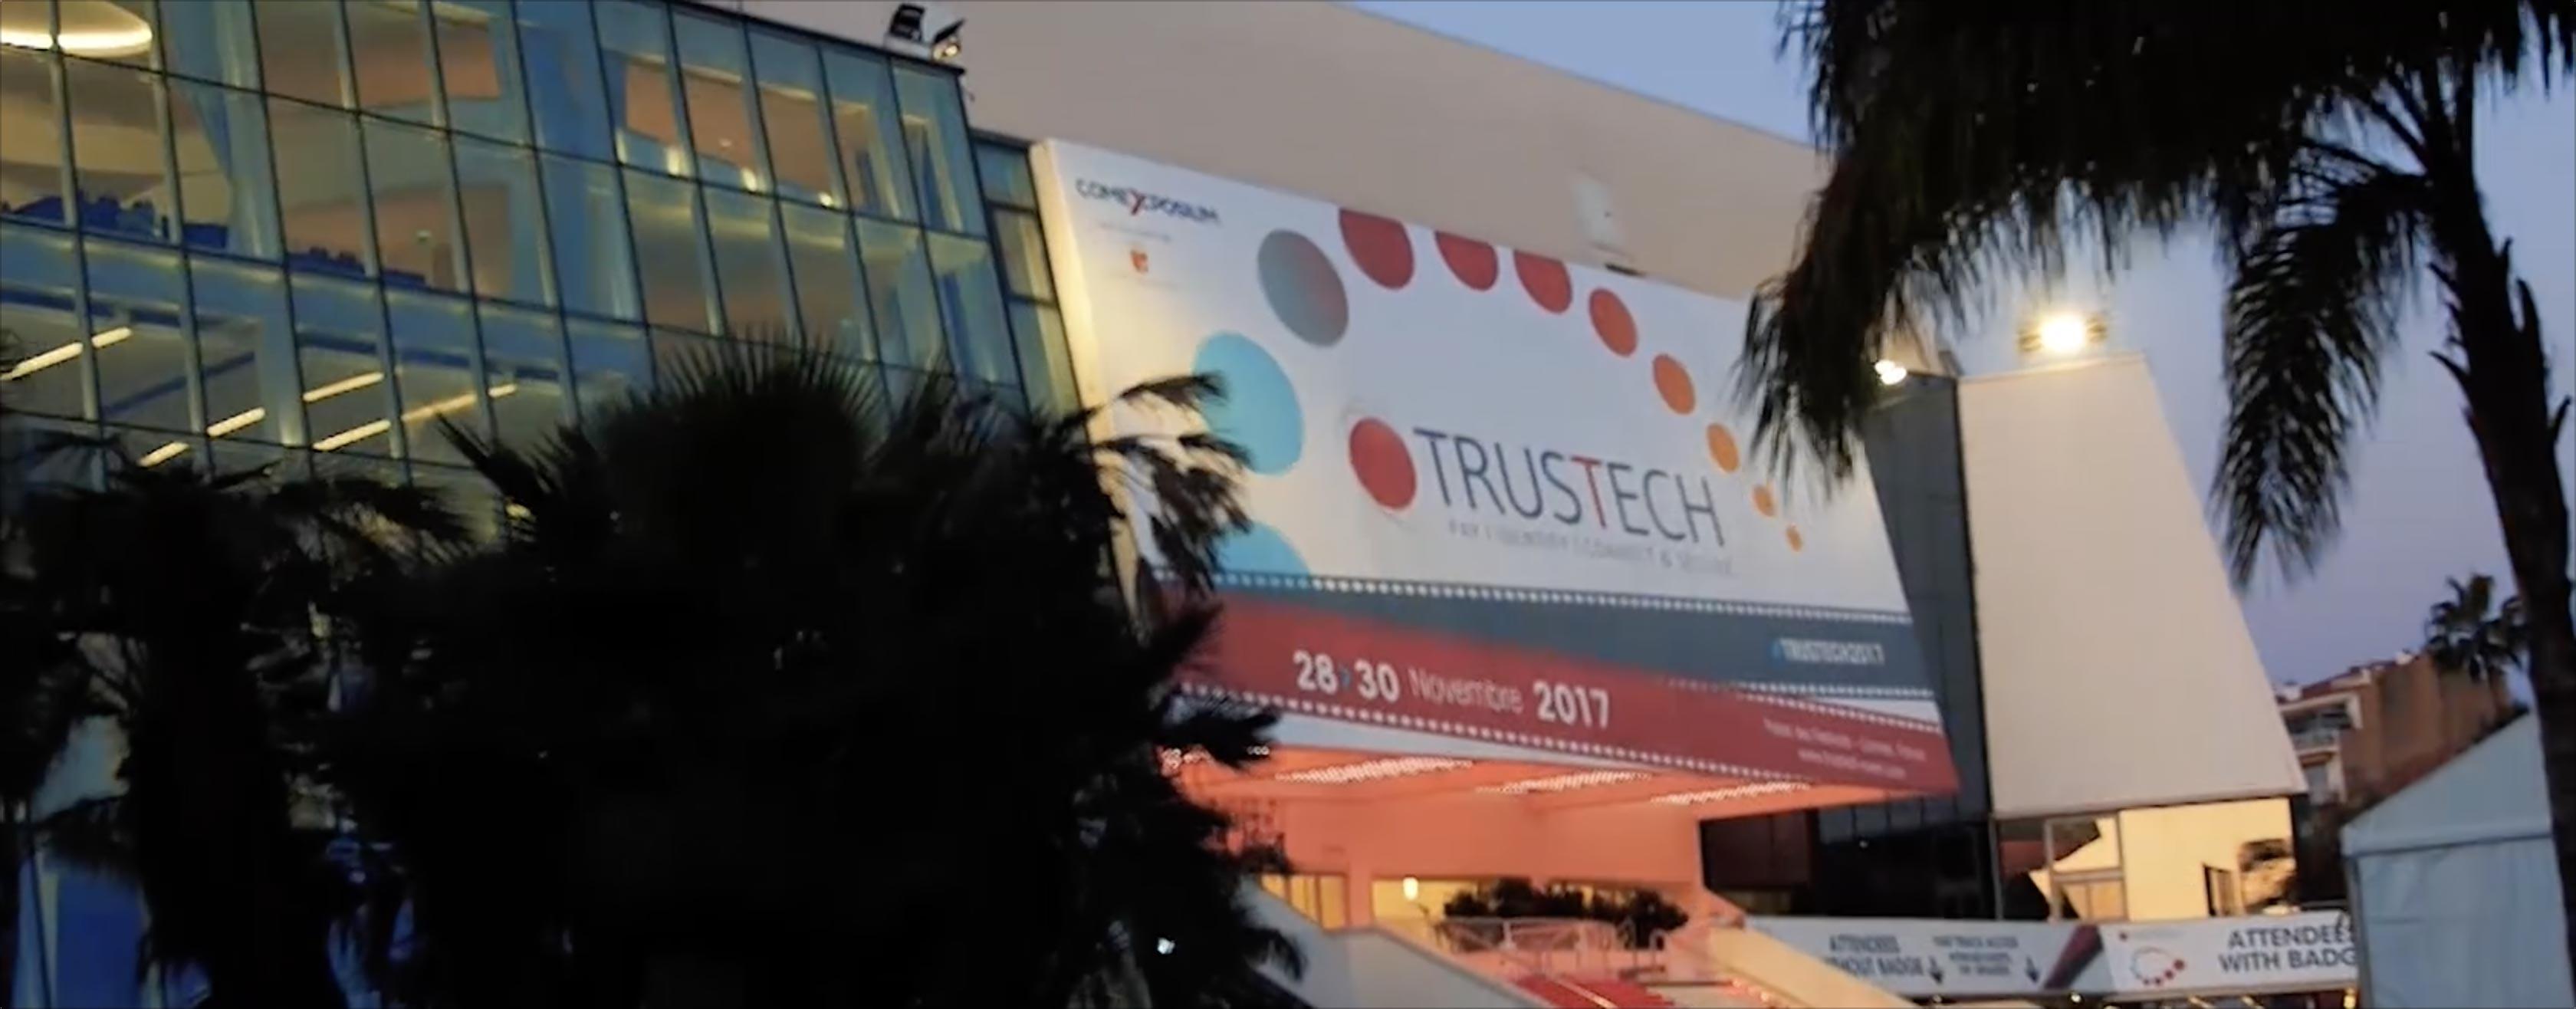 trustech cannes 2019